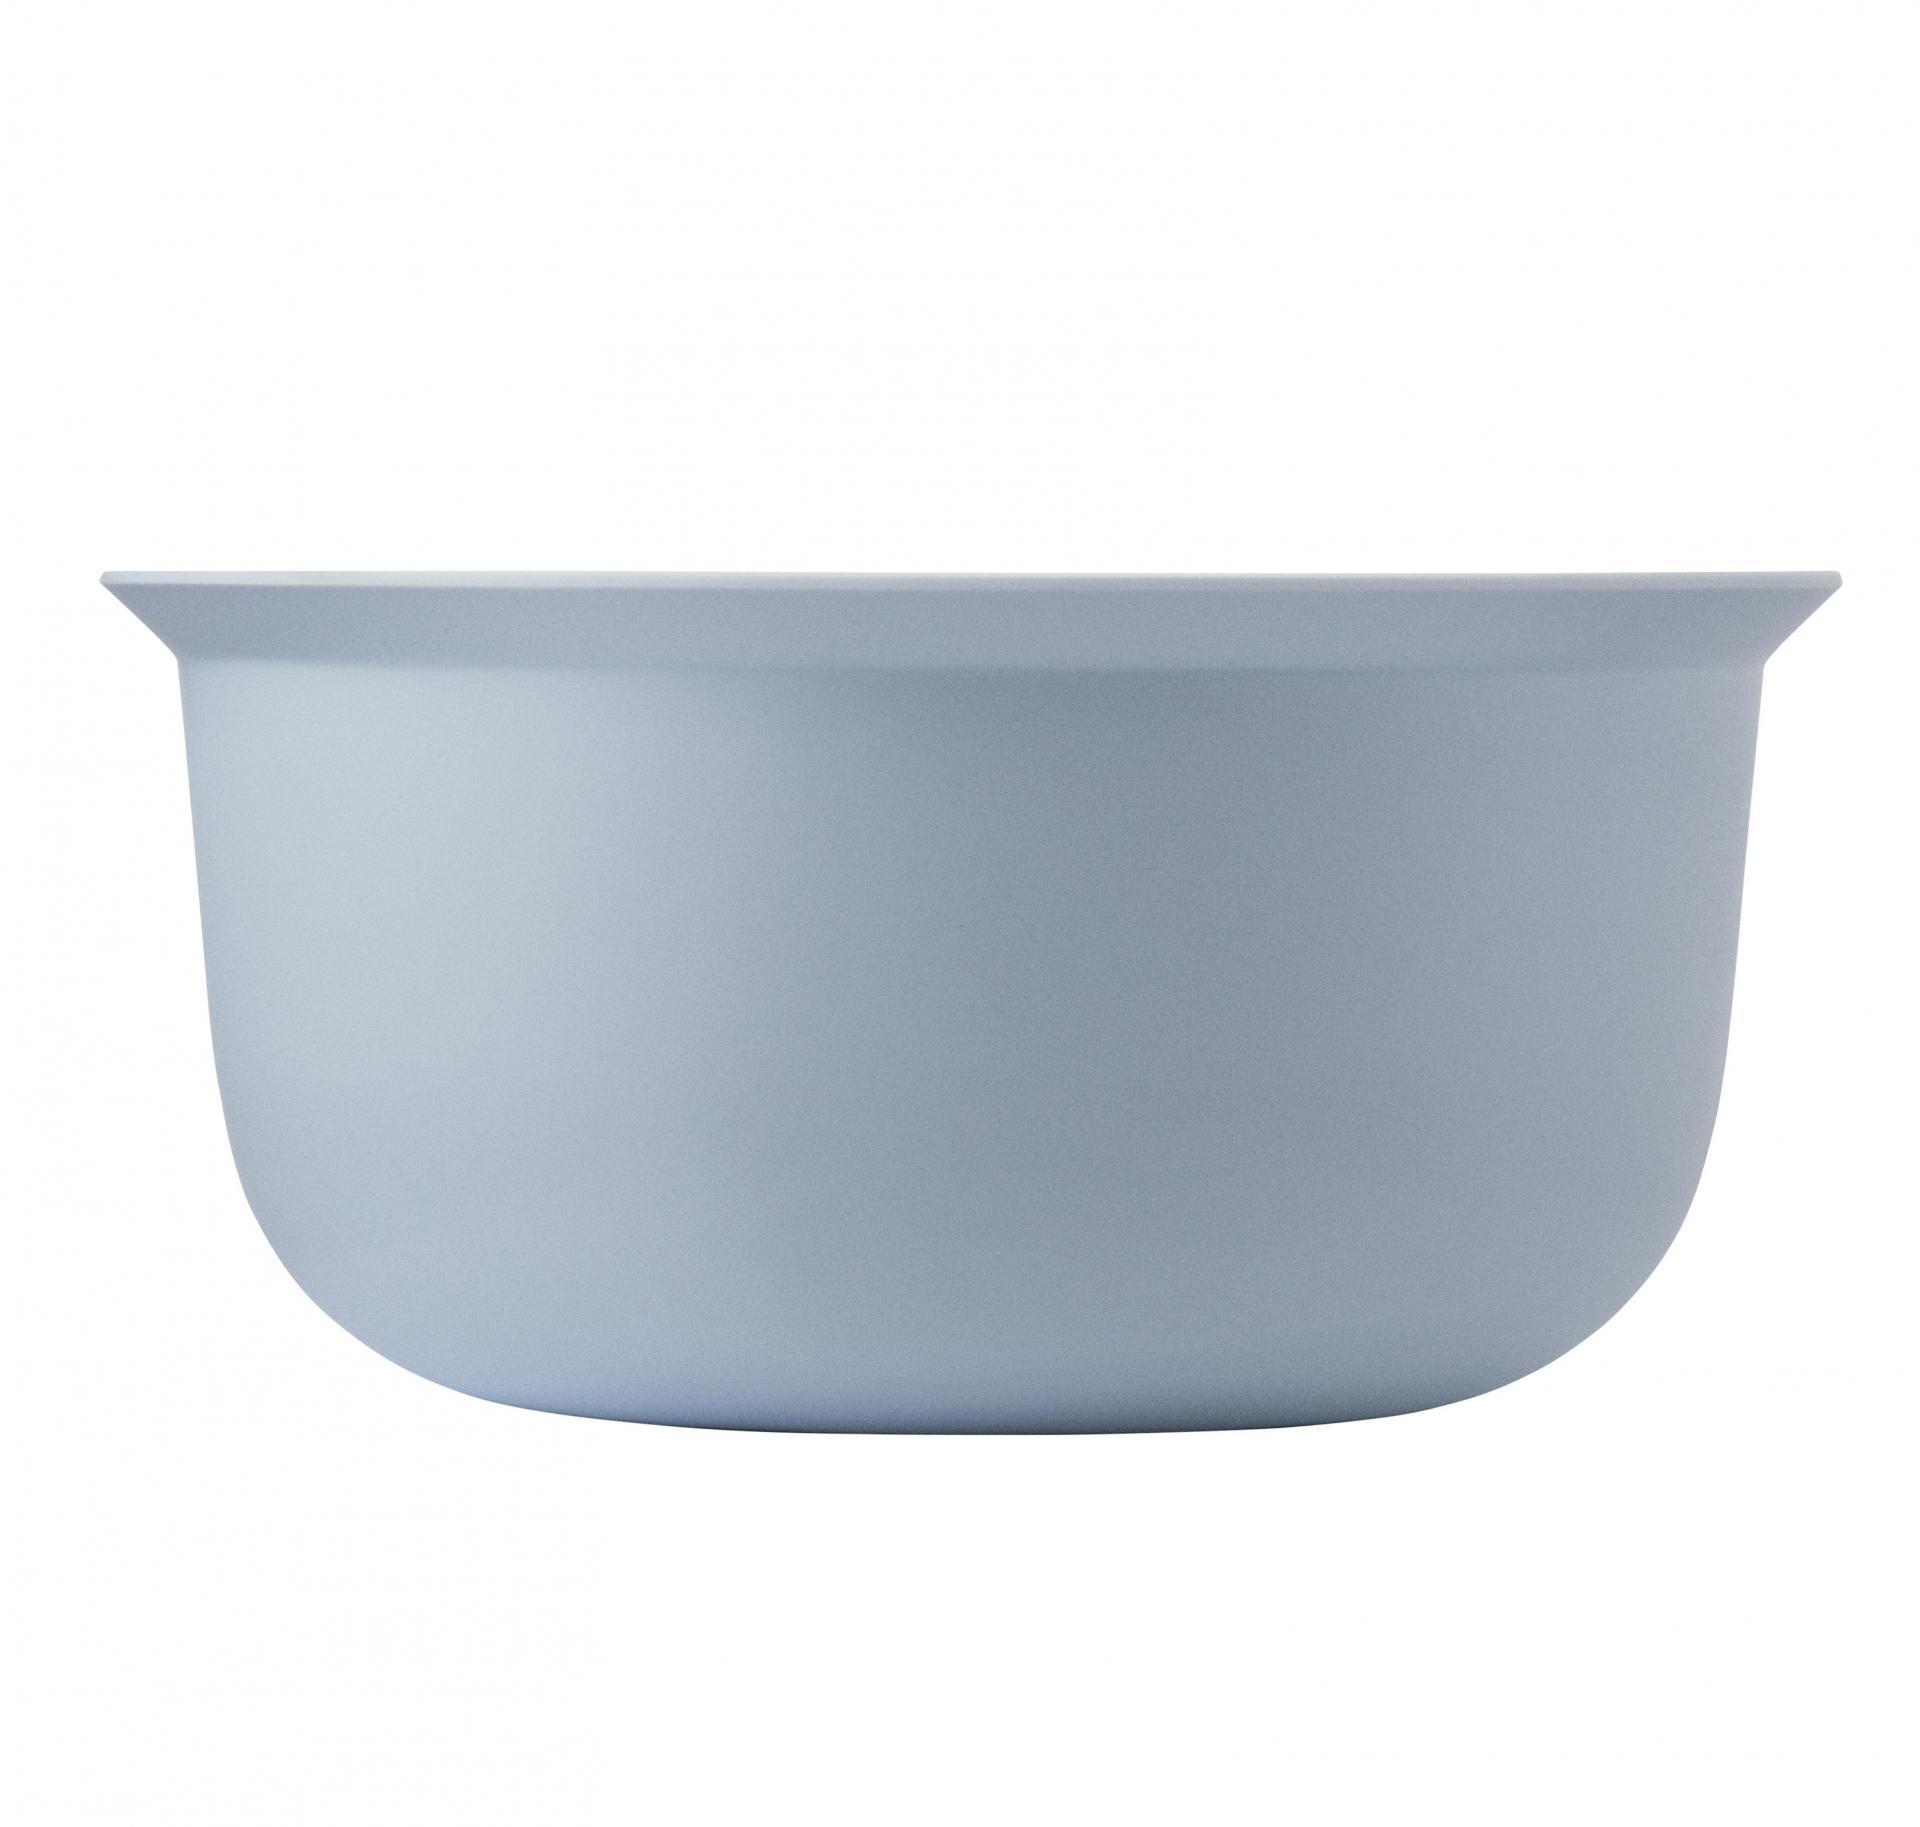 RIG-TIG Velká melaminová mísa Mix-It 3,5 l, modrá barva, melamin